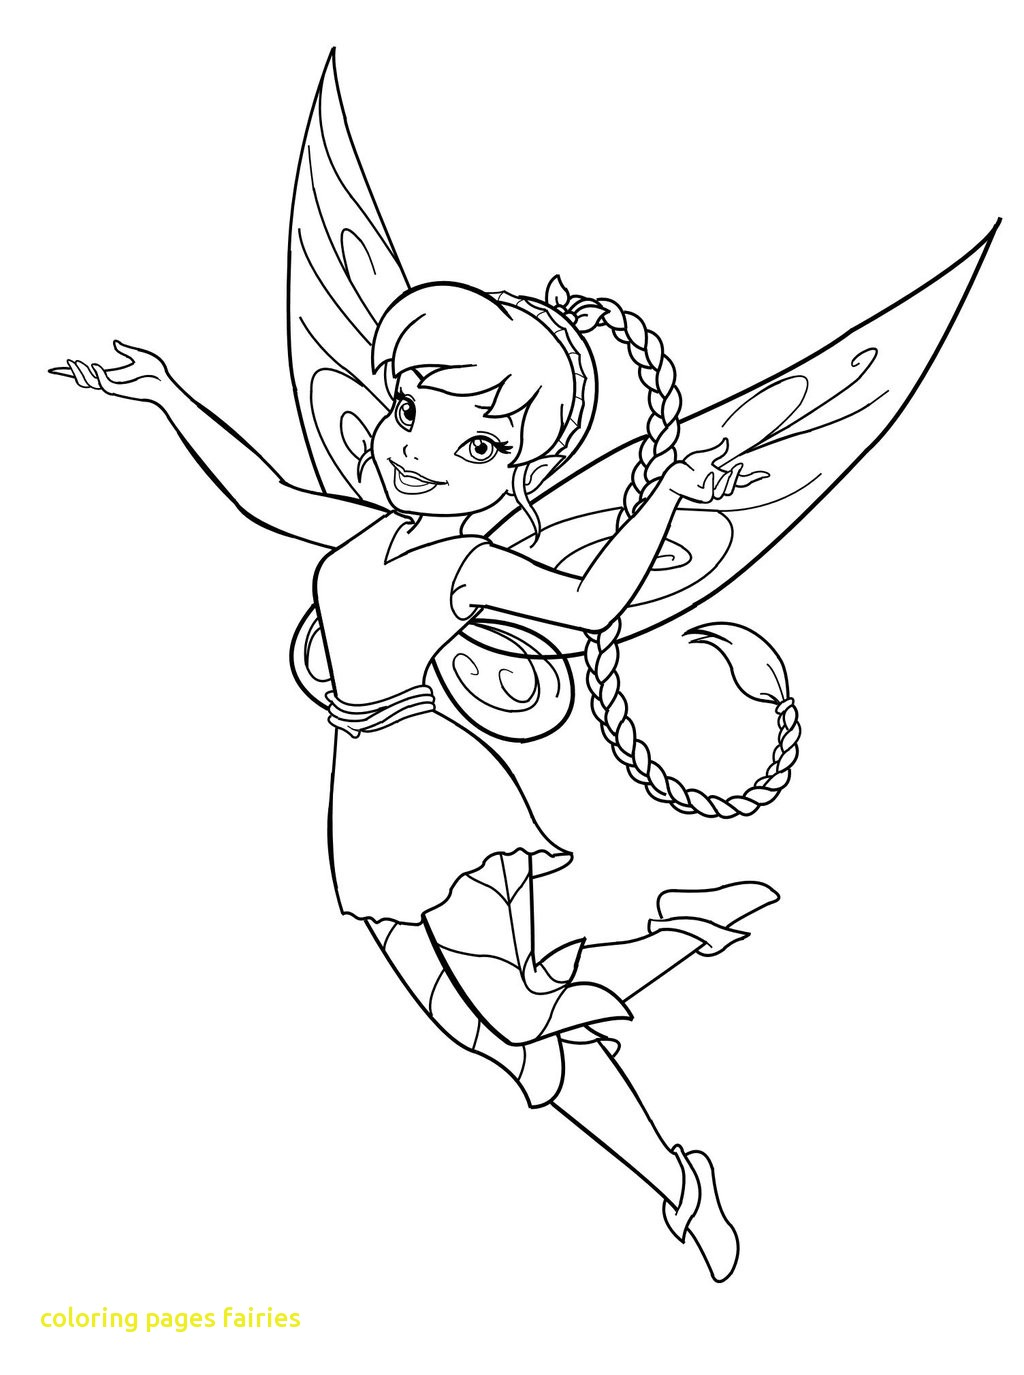 Silvermist Drawing